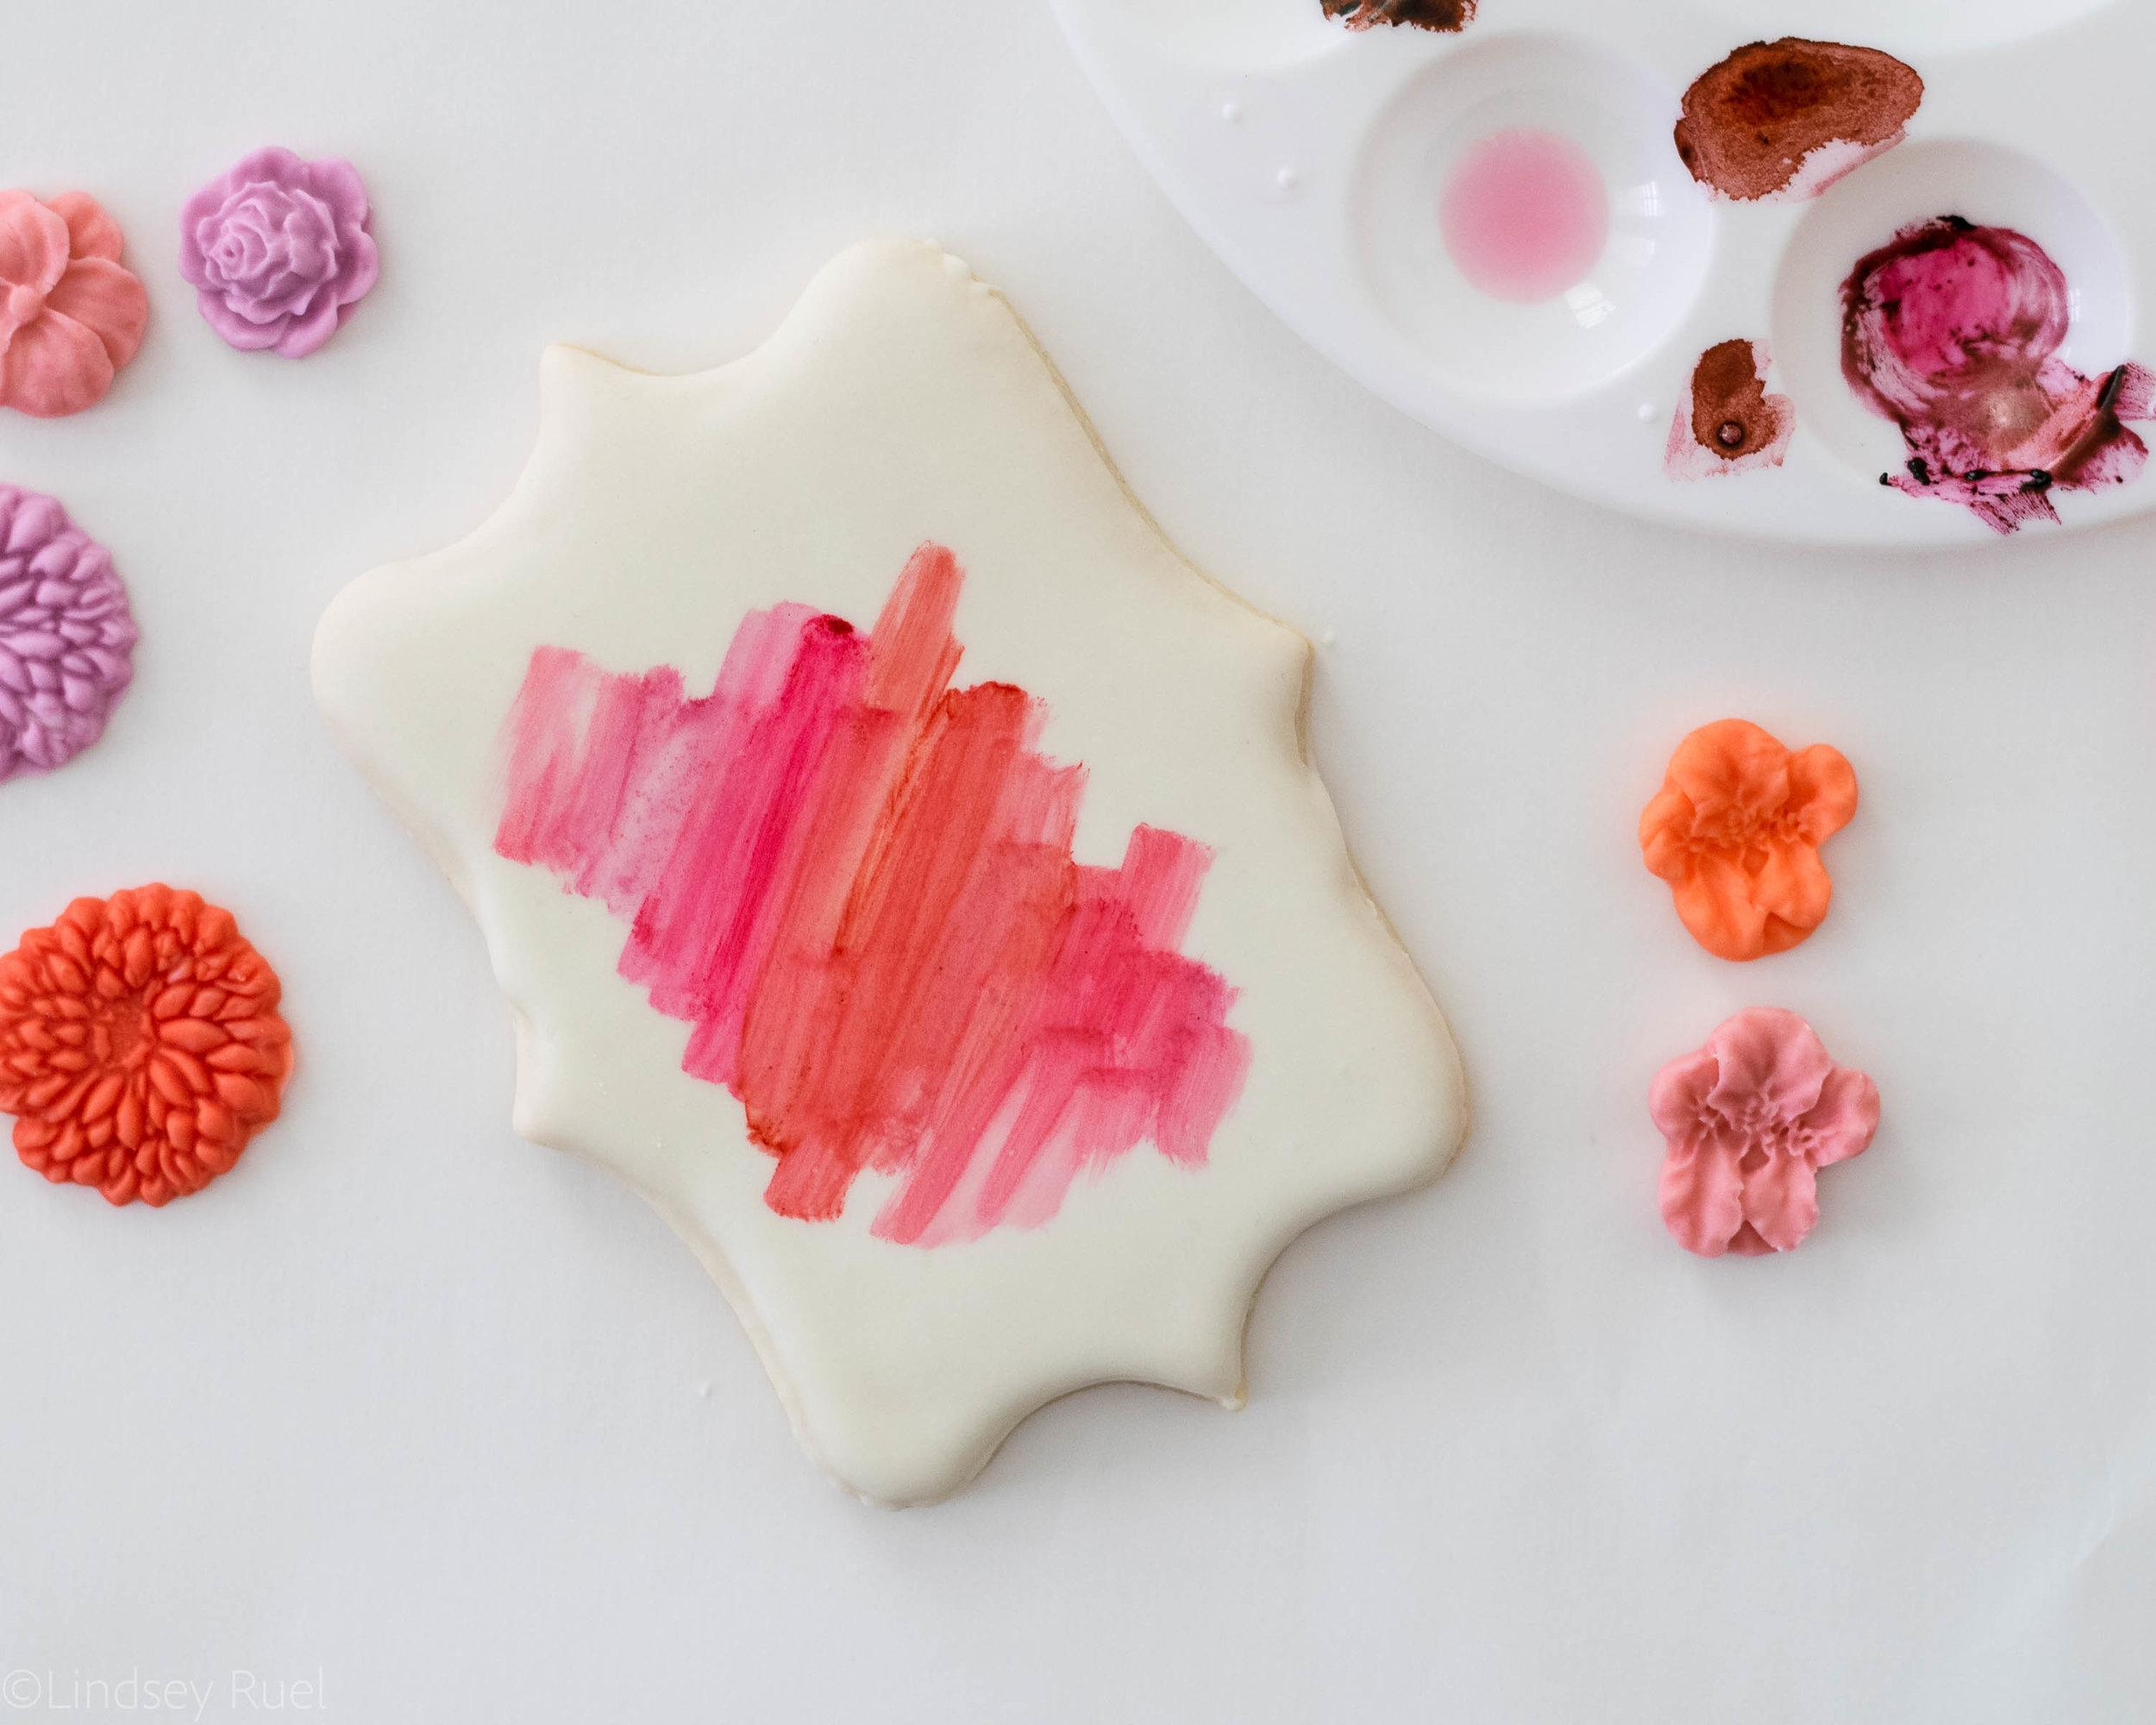 Fondant-Flower-Stem-Cookies-2.jpg